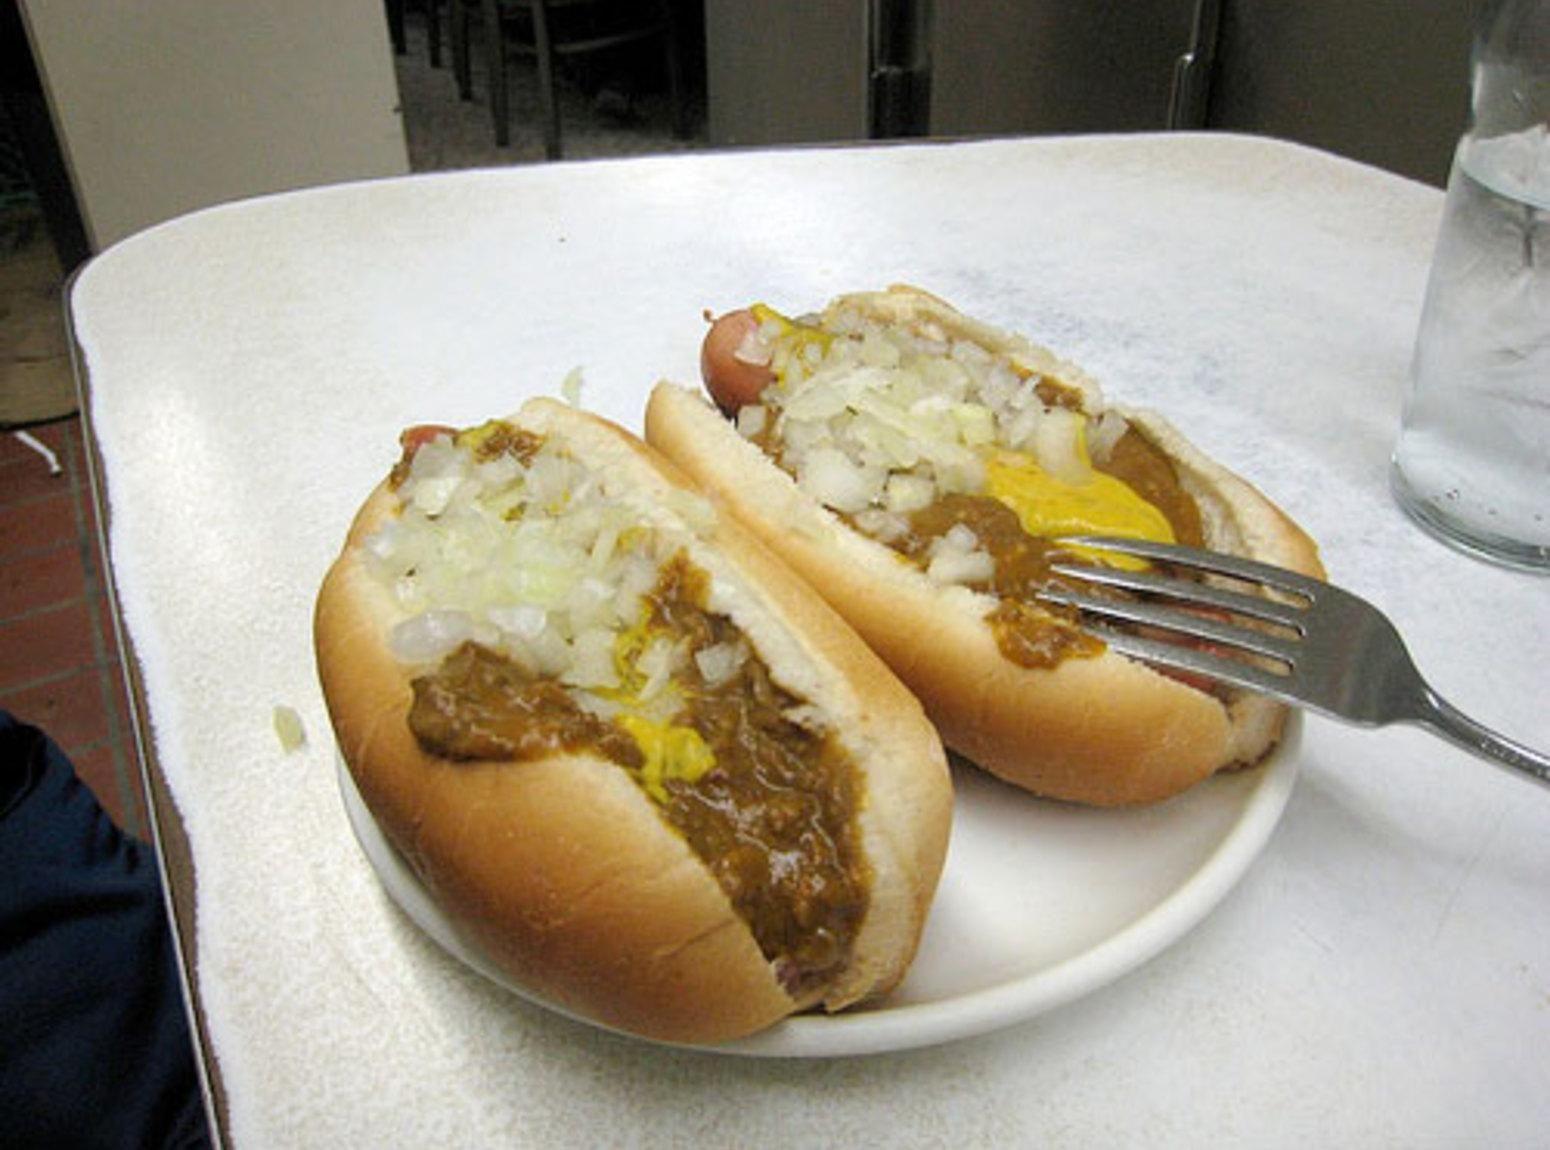 Copycat Lafayette Coney Island Sauce Recipe Hot Dog Chili Bow Wowwww Coney Dog Sauce Coney Sauce Hot Dog Chili